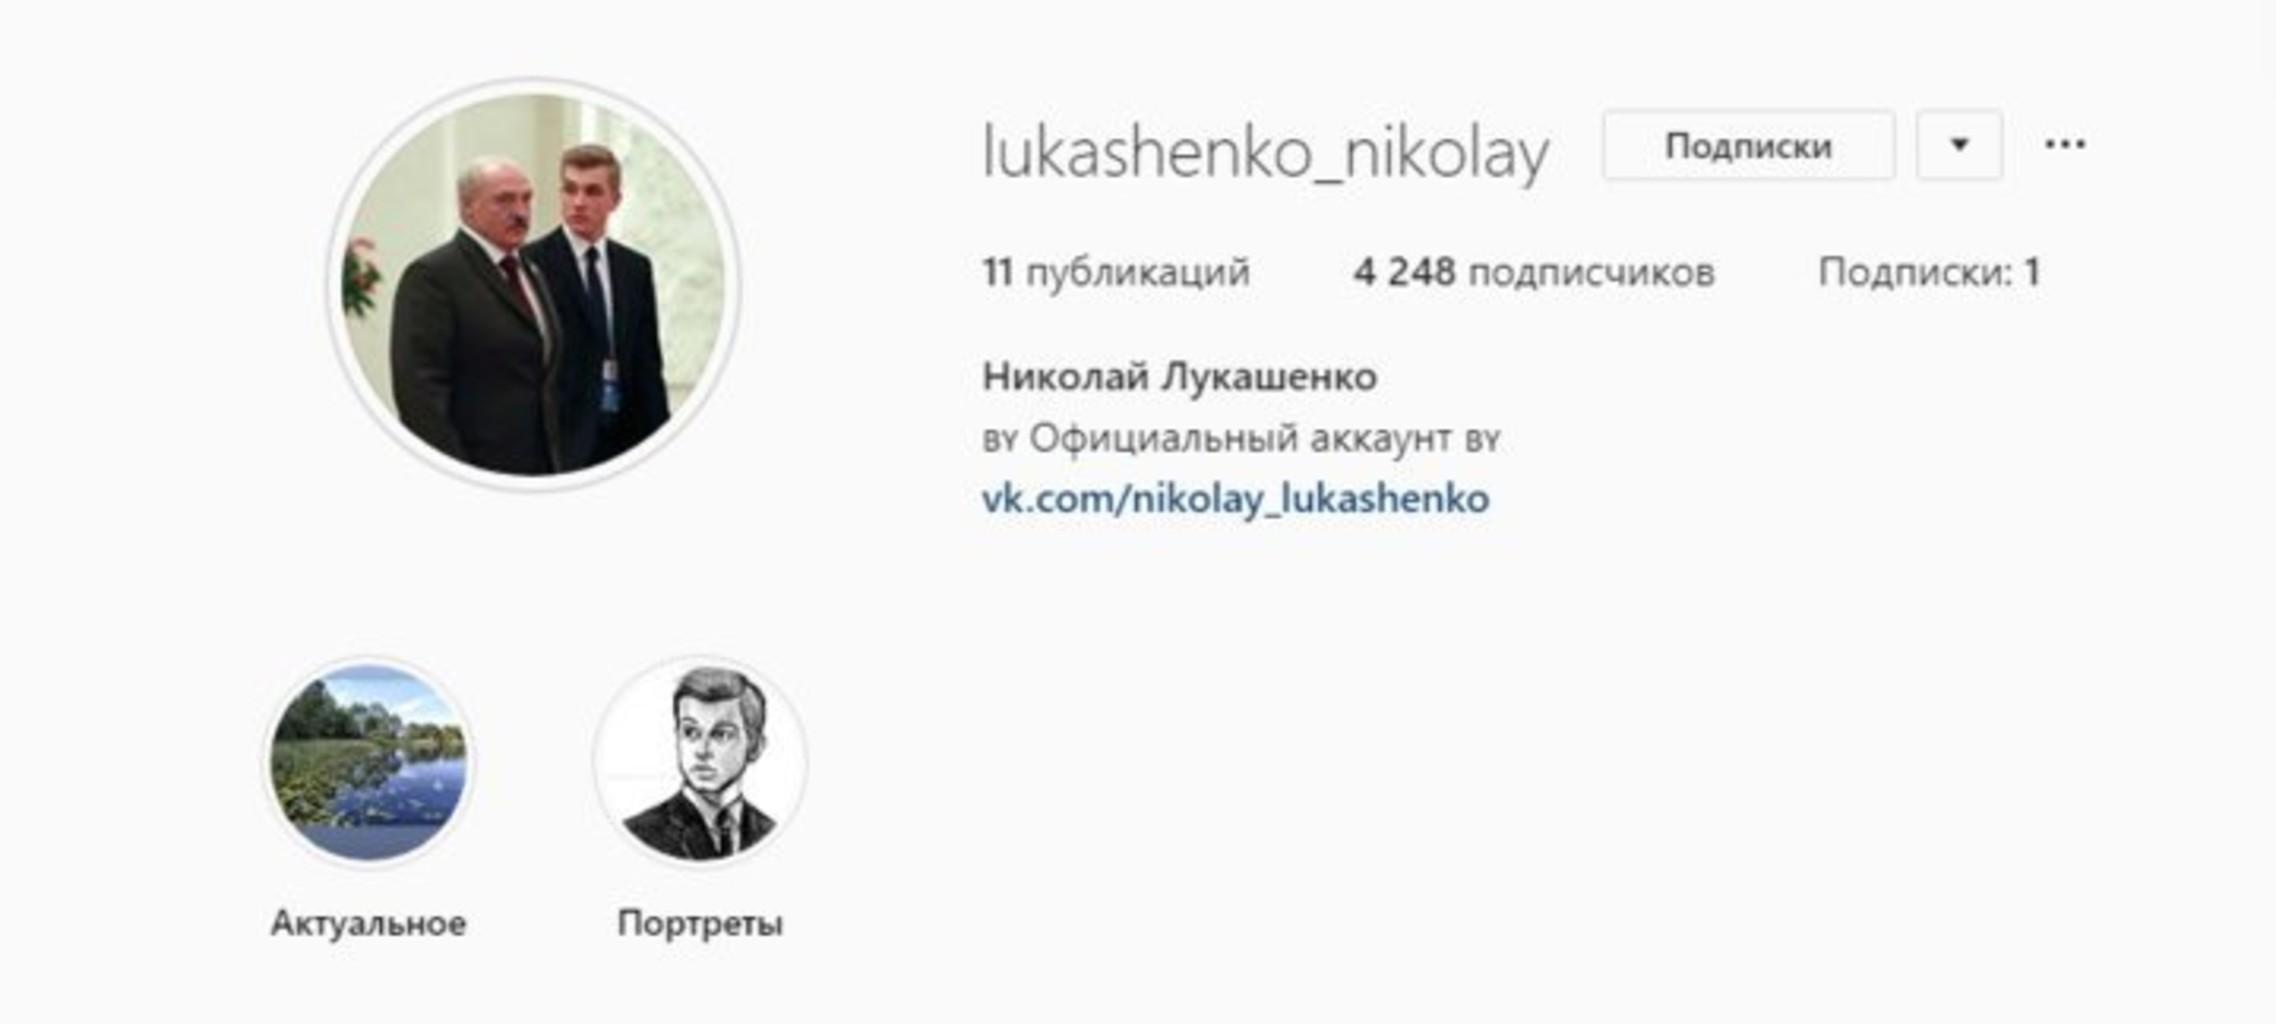 Instagram nikolaya lukashenko 9